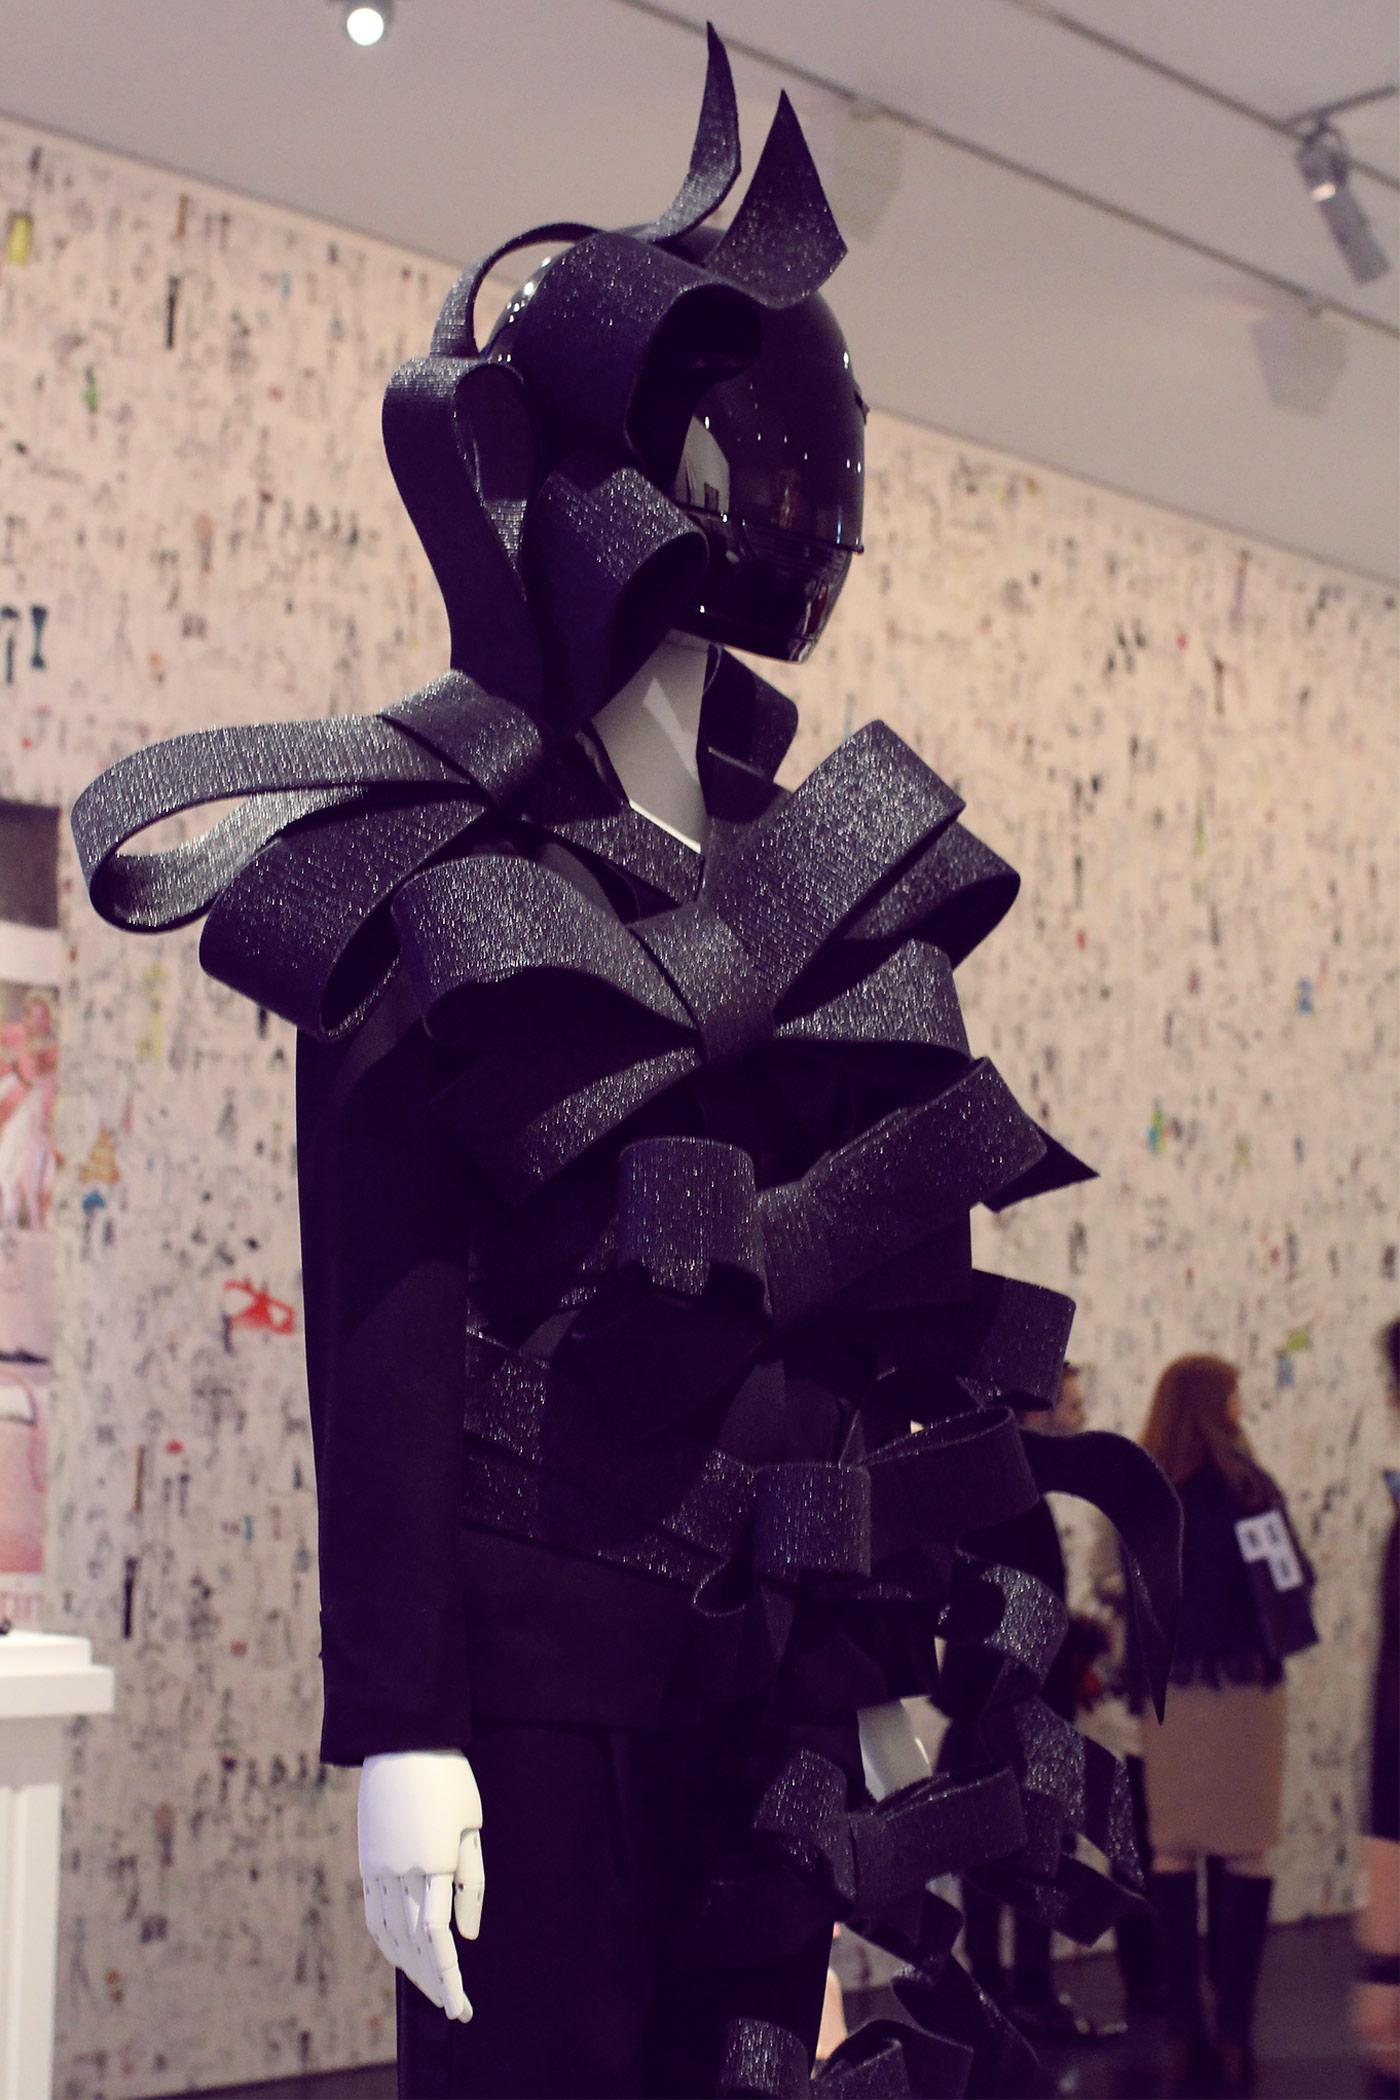 Viktor & Rolf Fashion Artists, NGV Australia